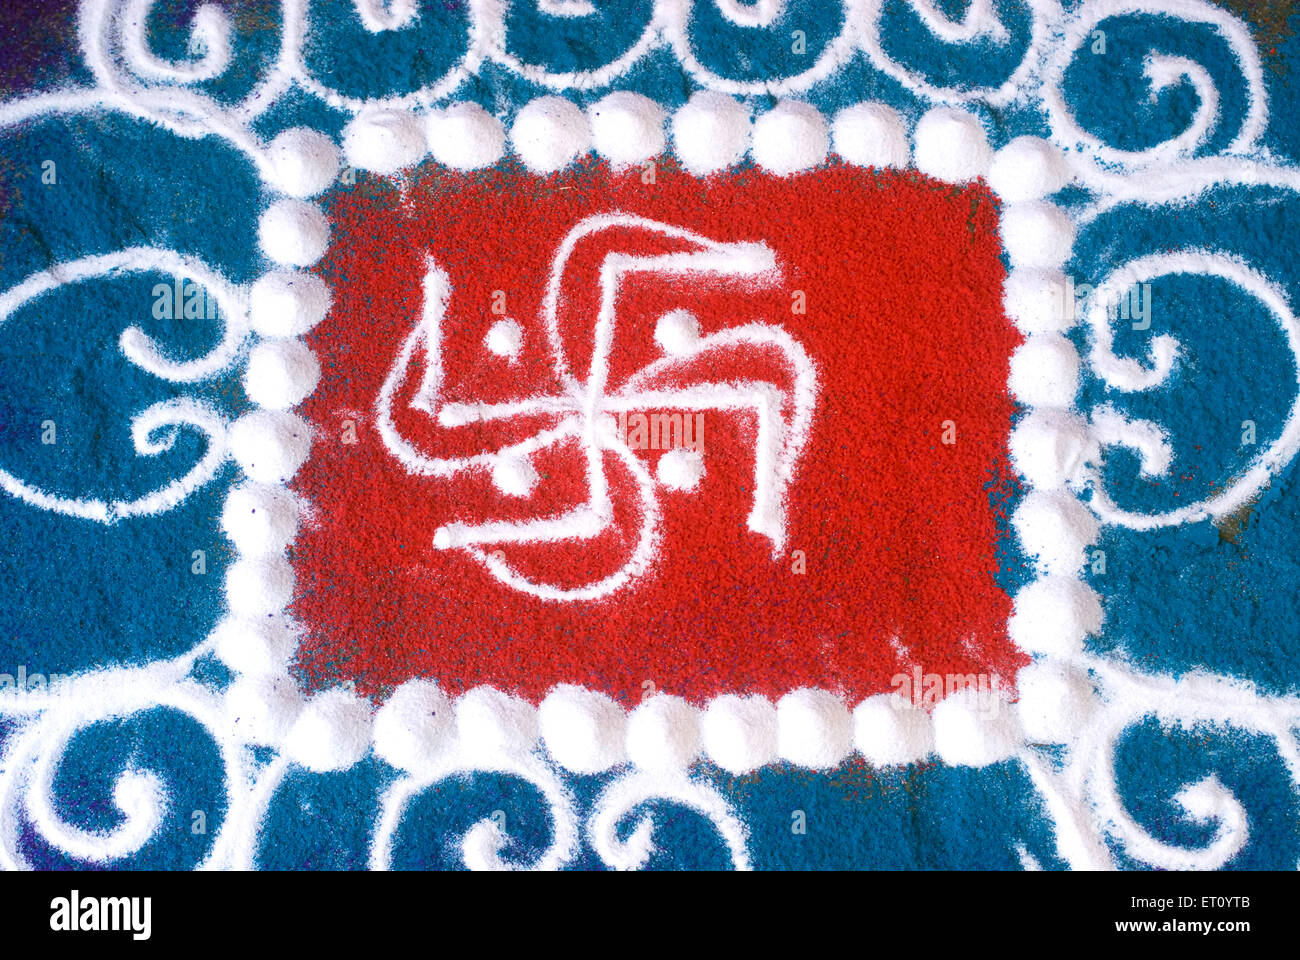 Swastika auspicious symbol rangoli floor design for celebrating Gudi Padva New Year of Hindu at Thane ; Maharashtra - Stock Image